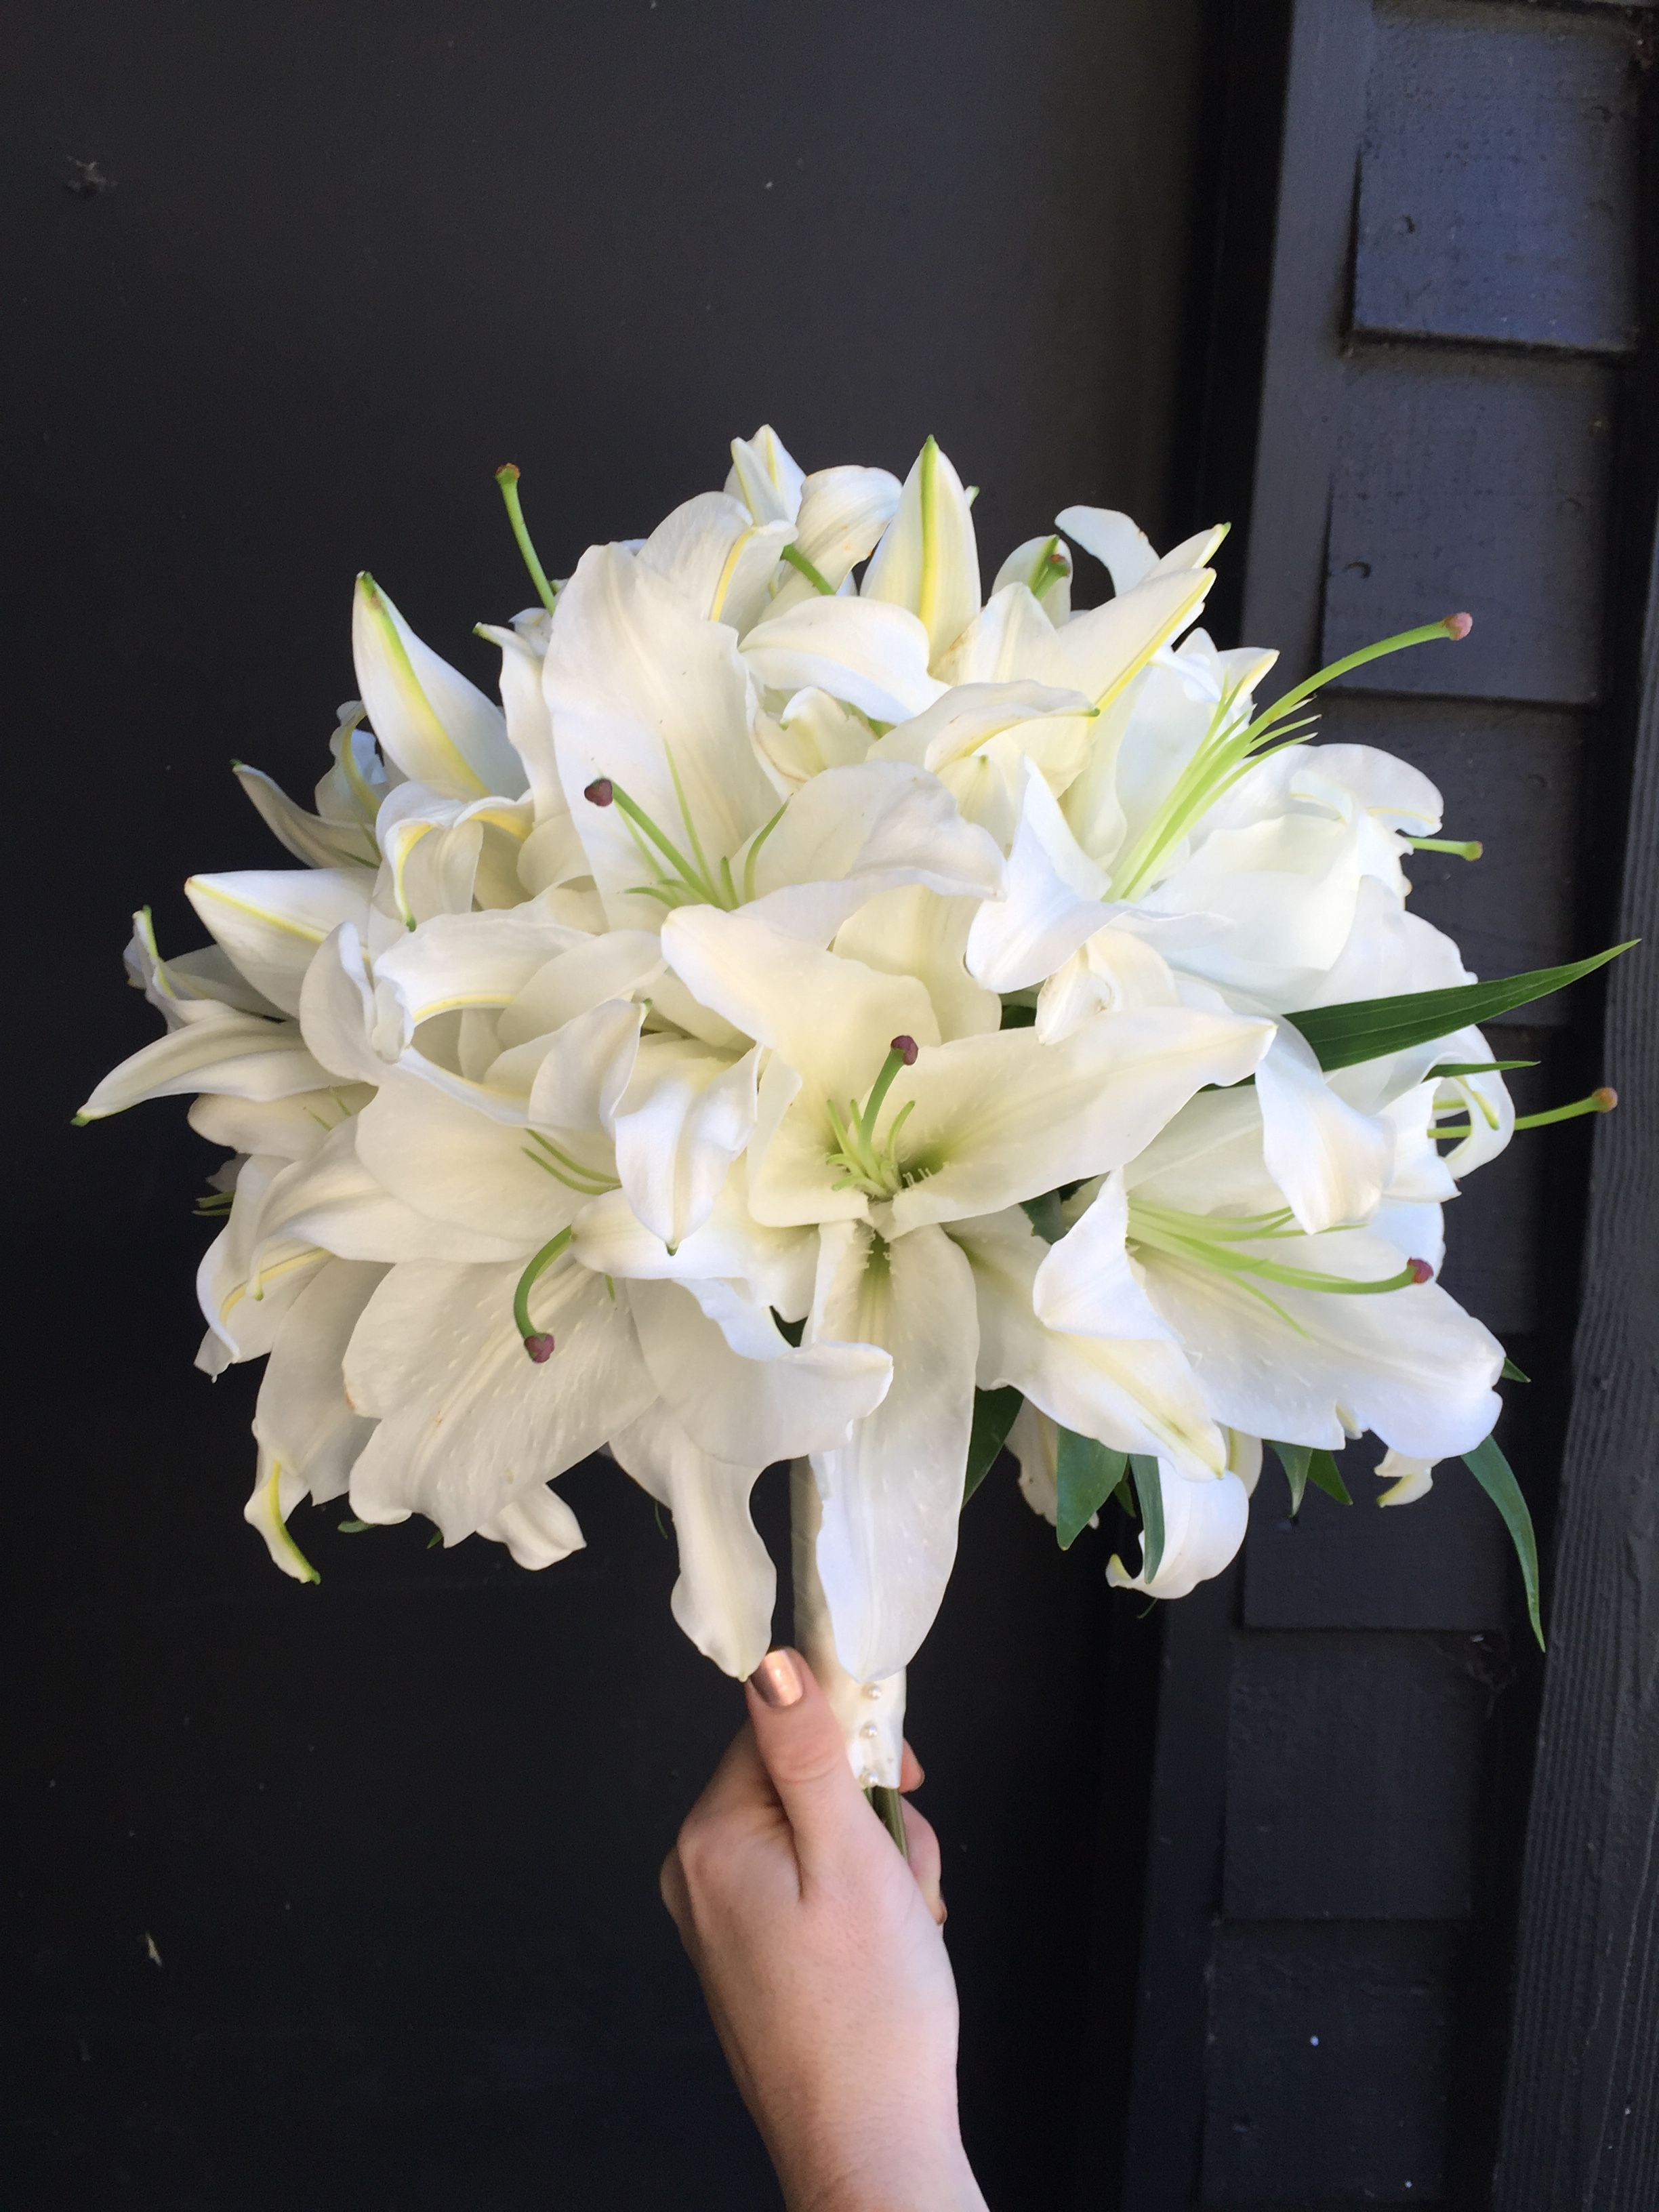 Casa Blanca Lily Bouquet Lily Bouquet Wedding Brides Flowers Bouquet Lilly Bouquet Wedding